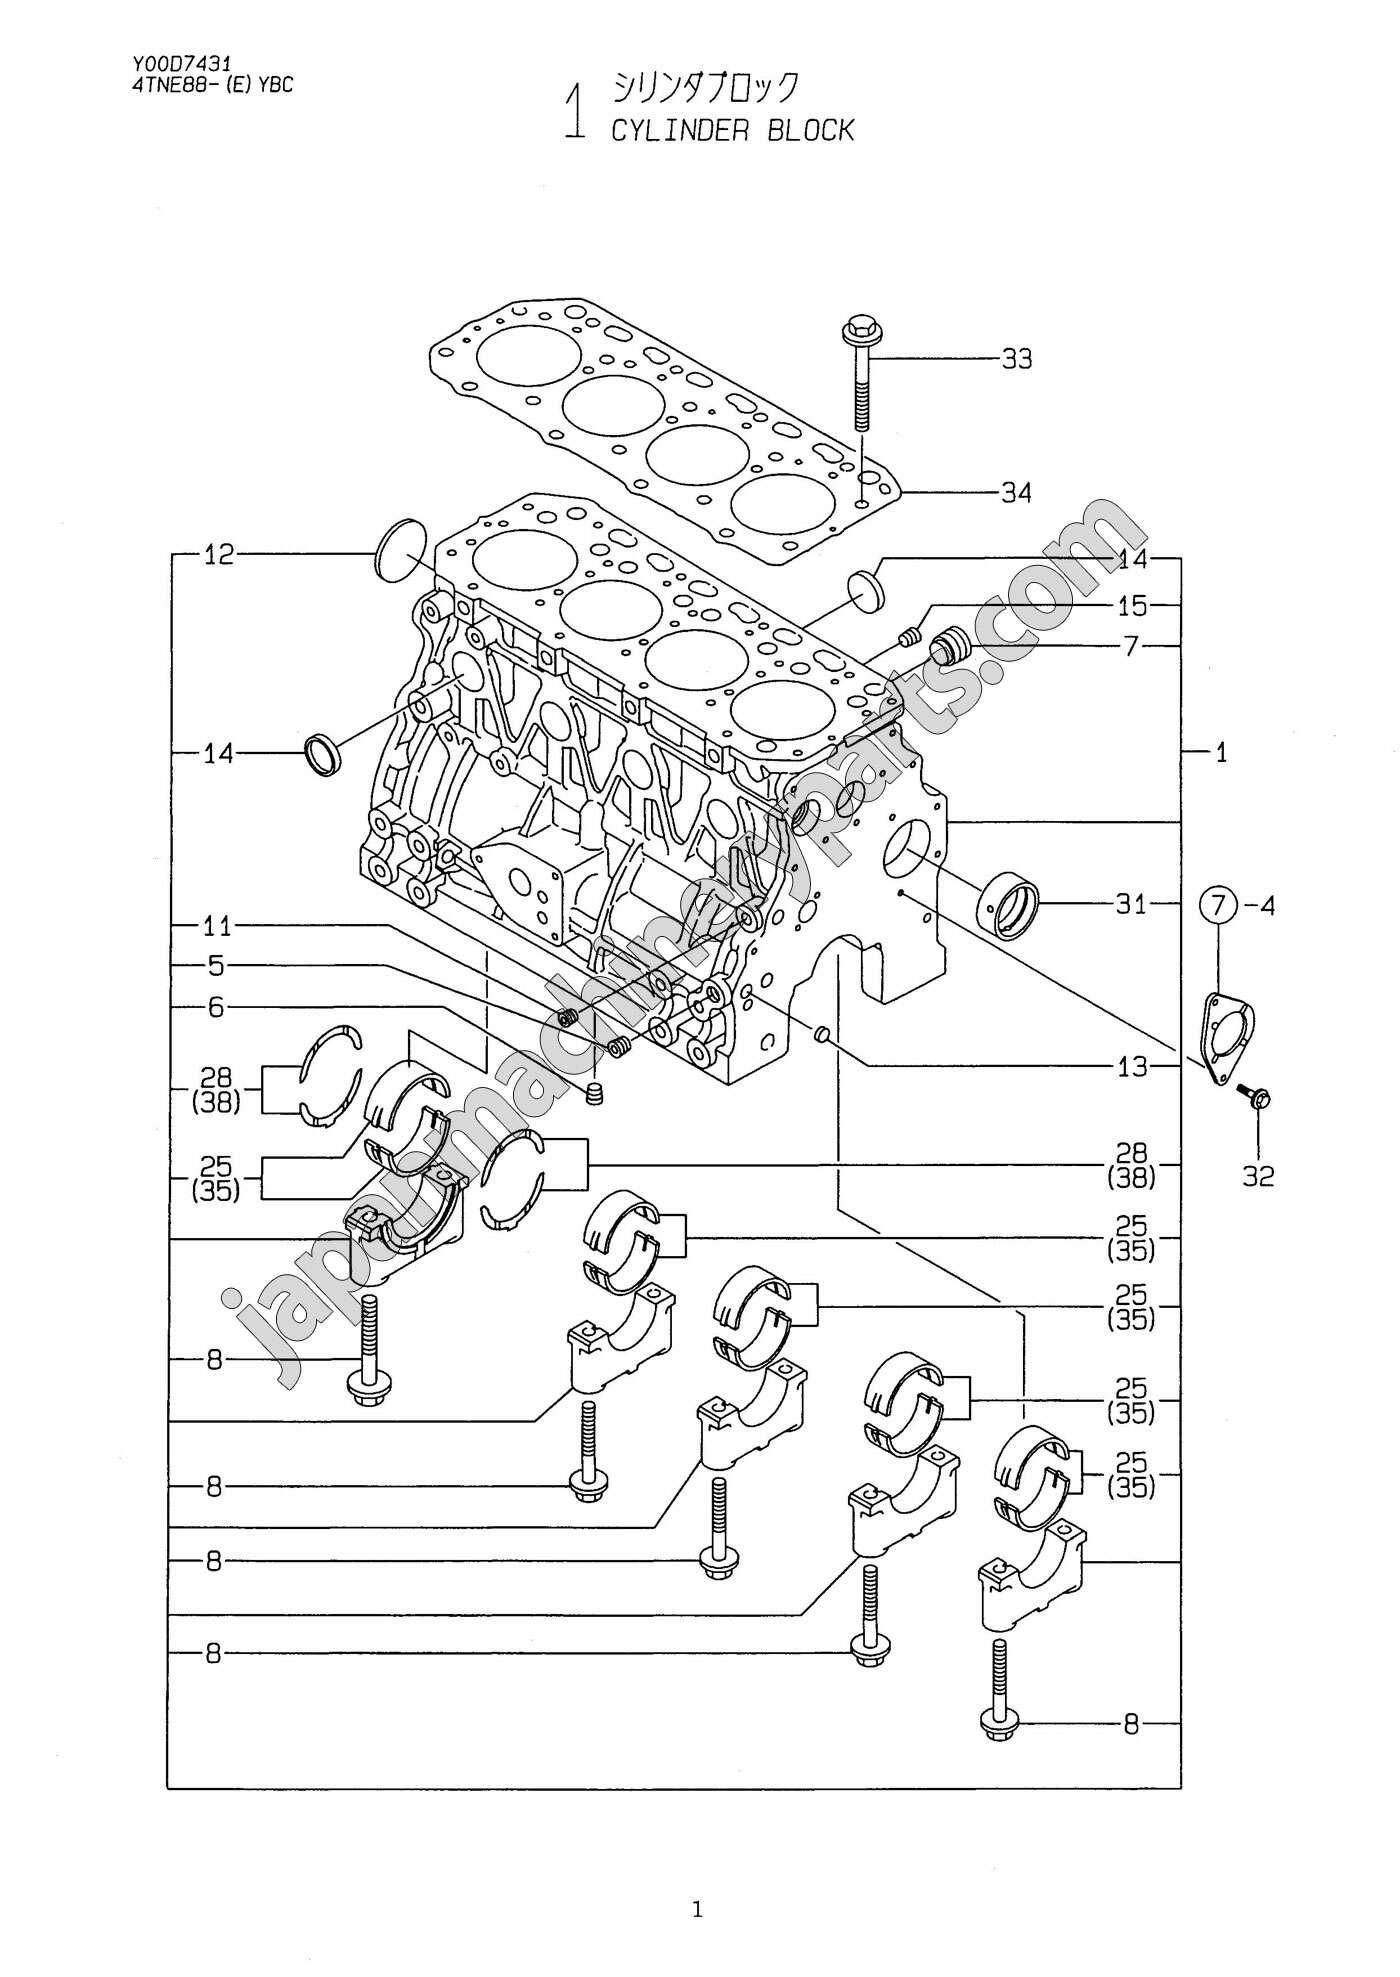 hight resolution of yanmar 1700 ignition wiring diagram trusted wiring diagrams yanmar generator wiring diagram yanmar 1700 ignition wiring diagram